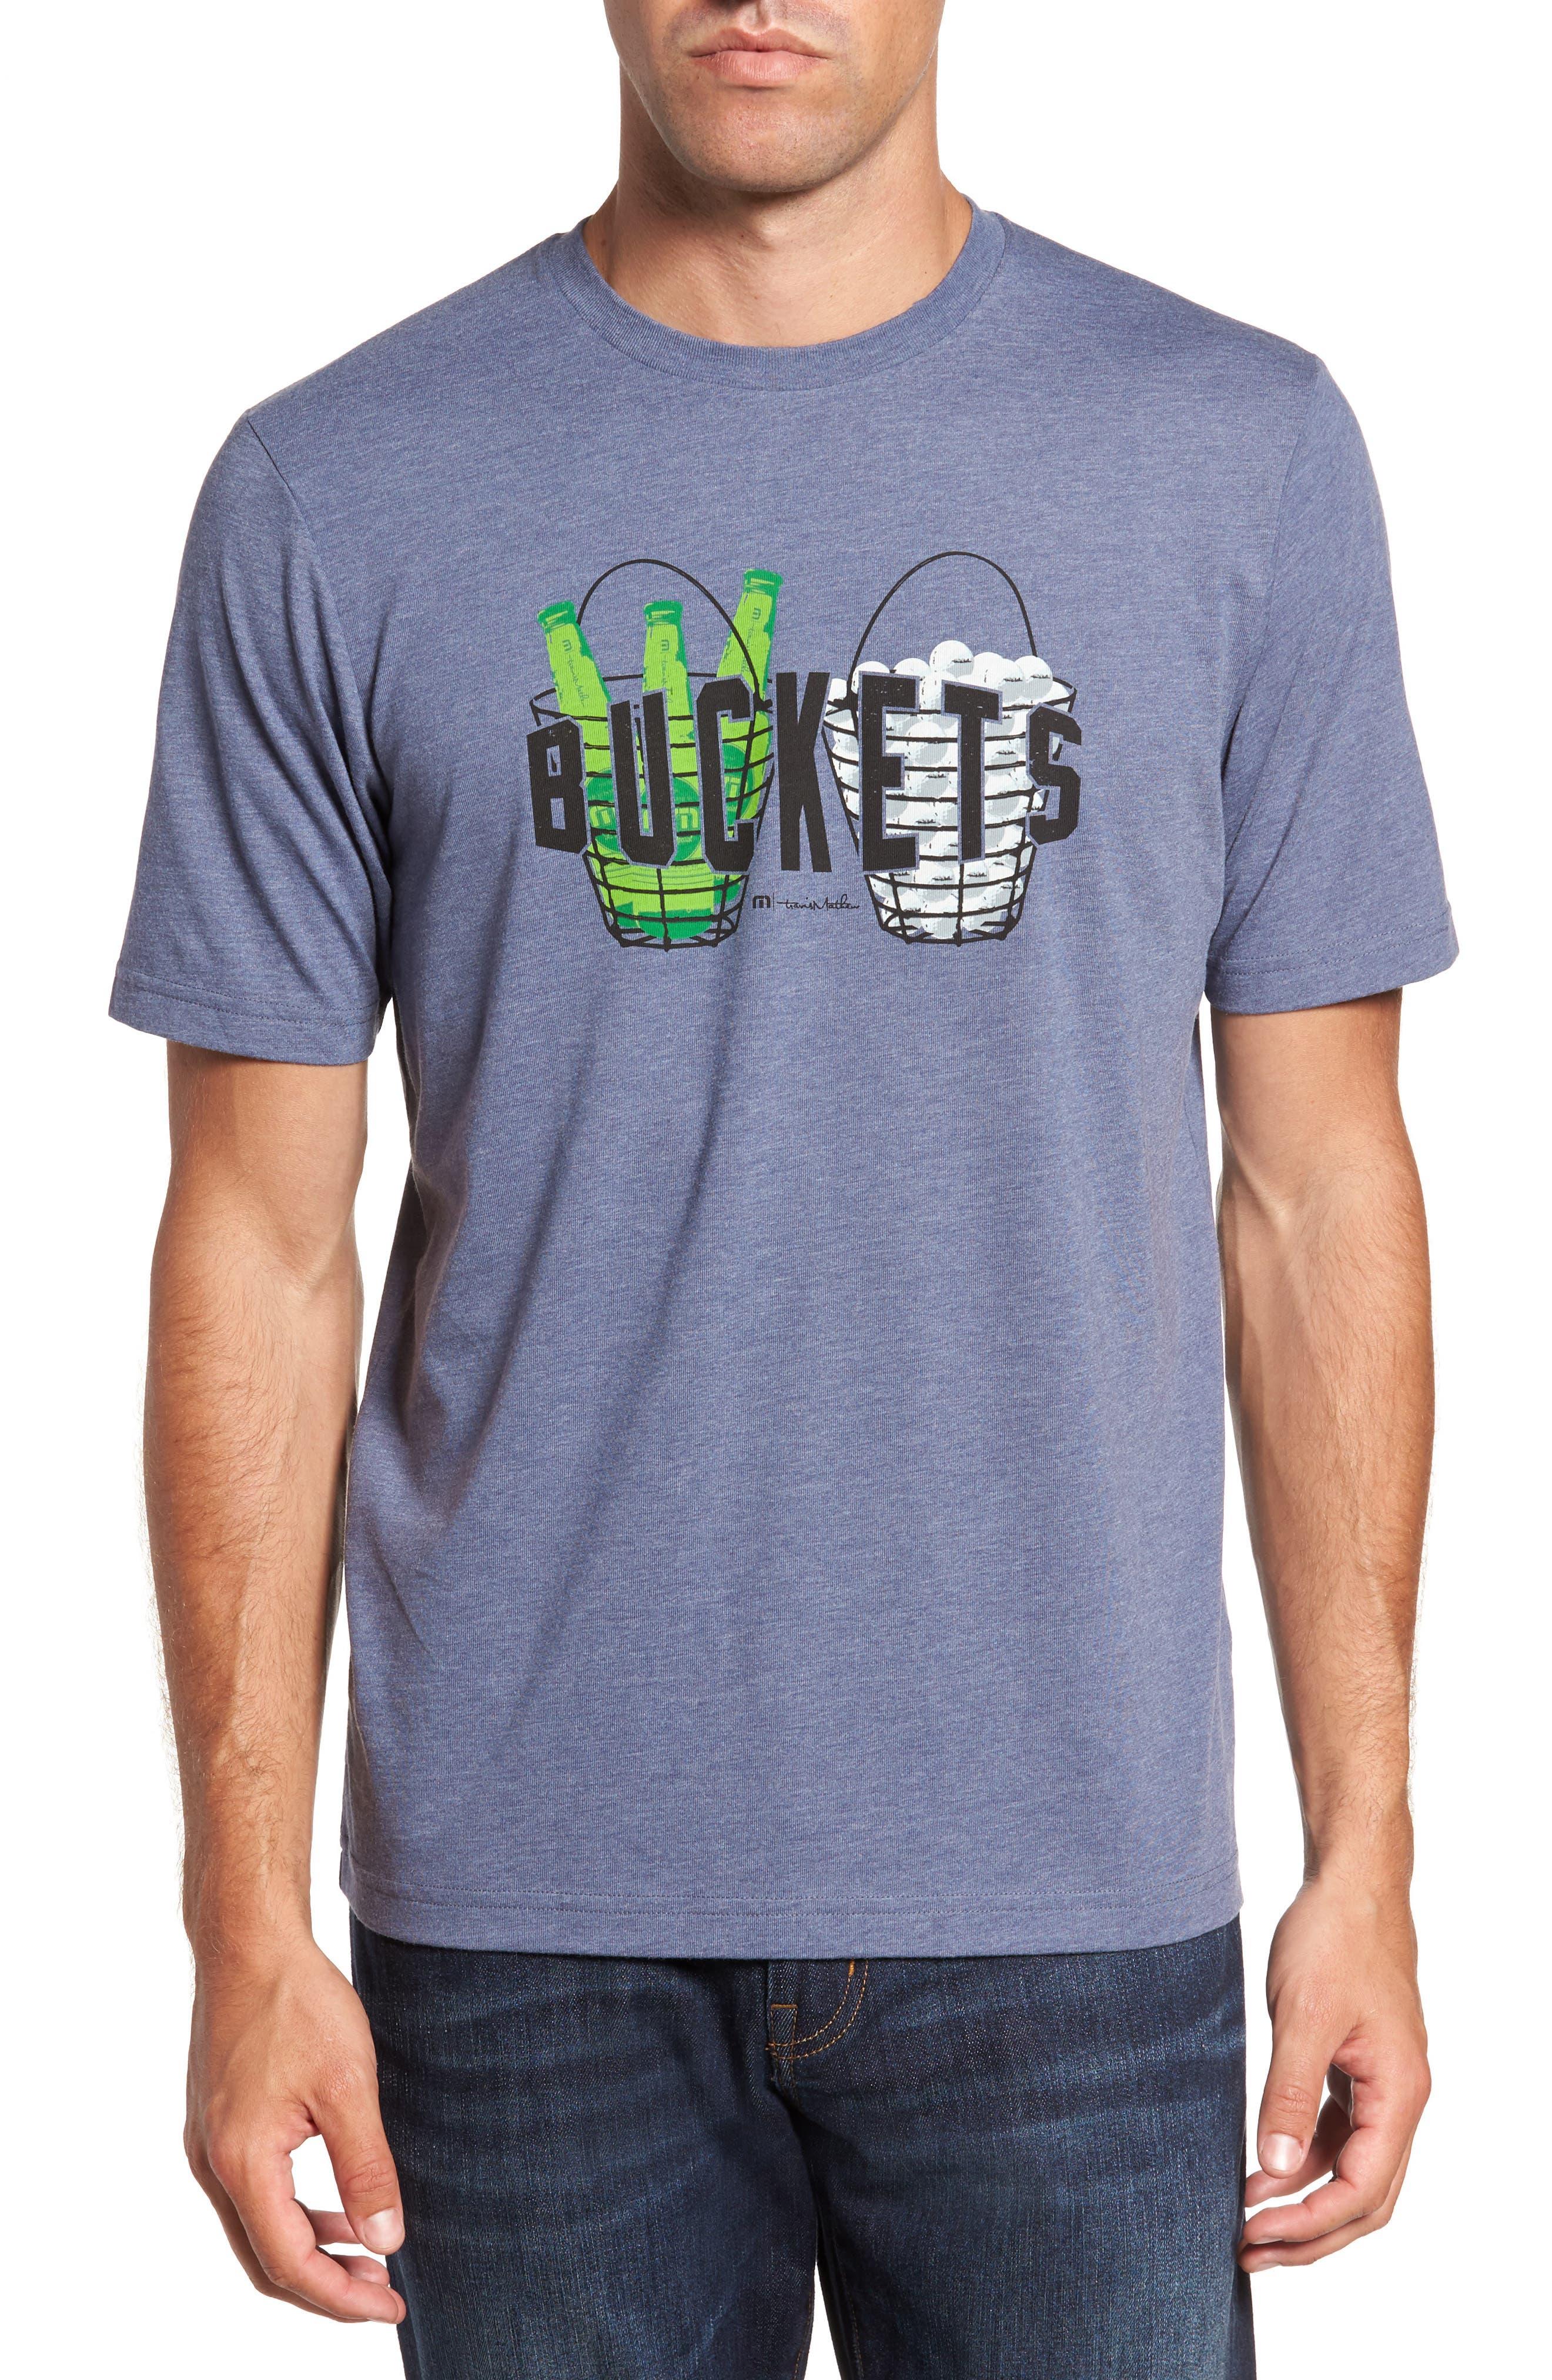 Travis Mathew 'Buckets' Graphic T-Shirt